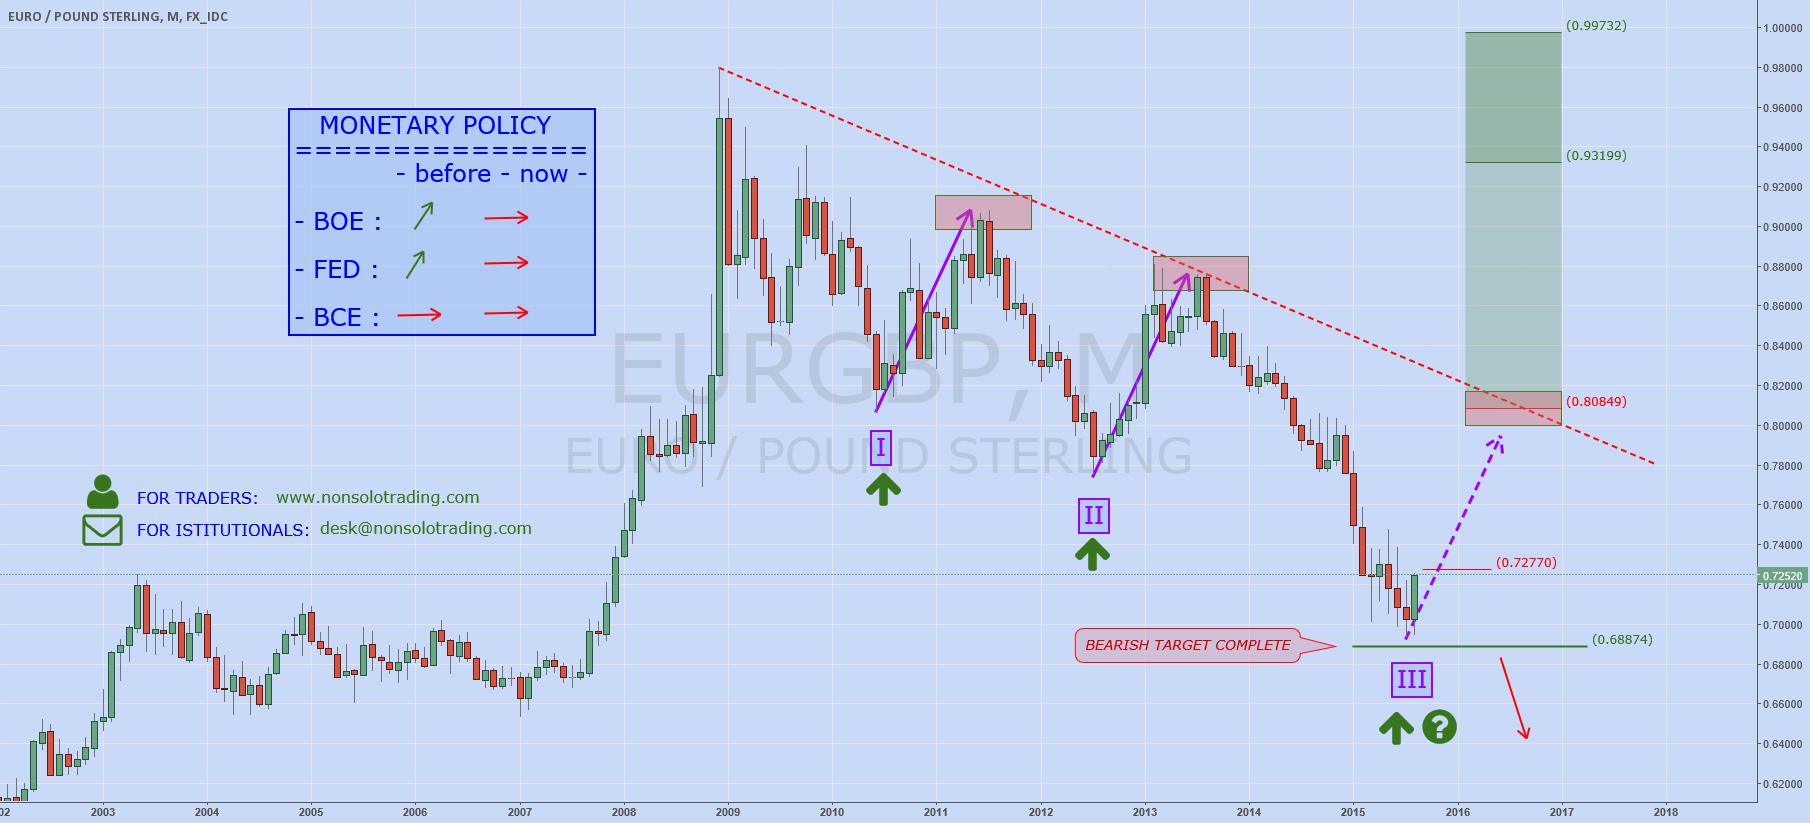 EURGBP: Rebound Time?